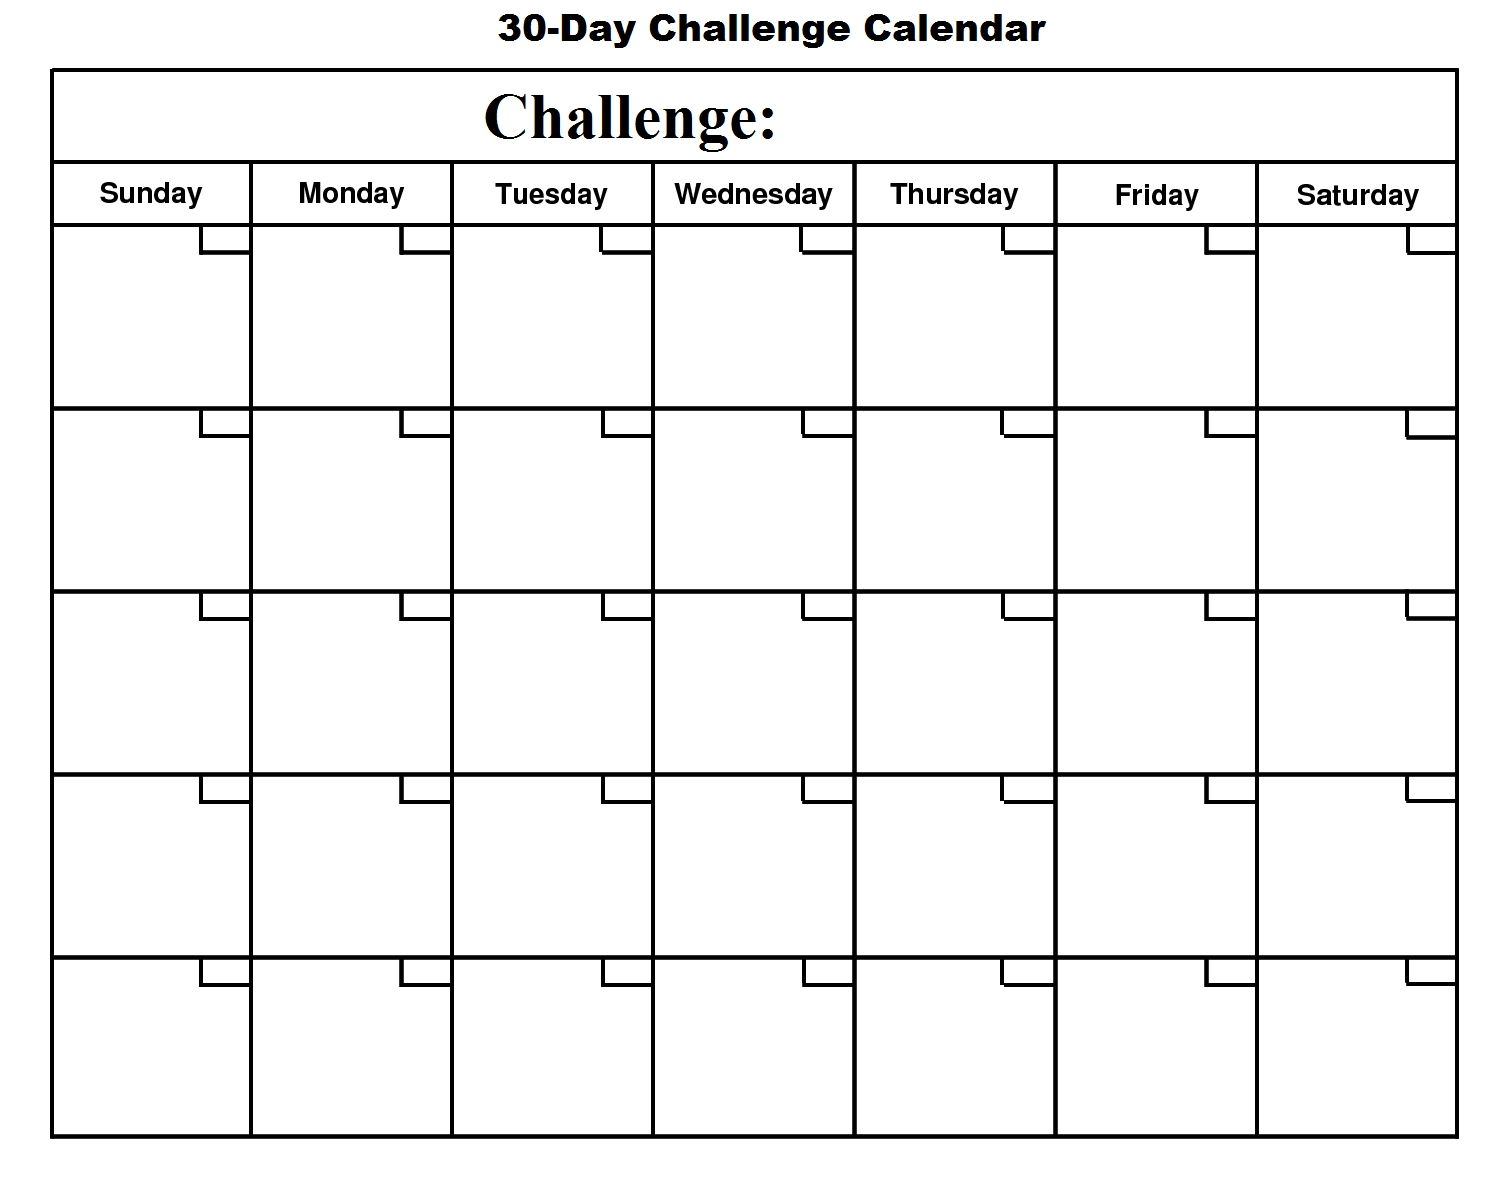 Printable 30 Day Calendar  Printable 360 Degree | Blank inside 30 Day Calendar Printable